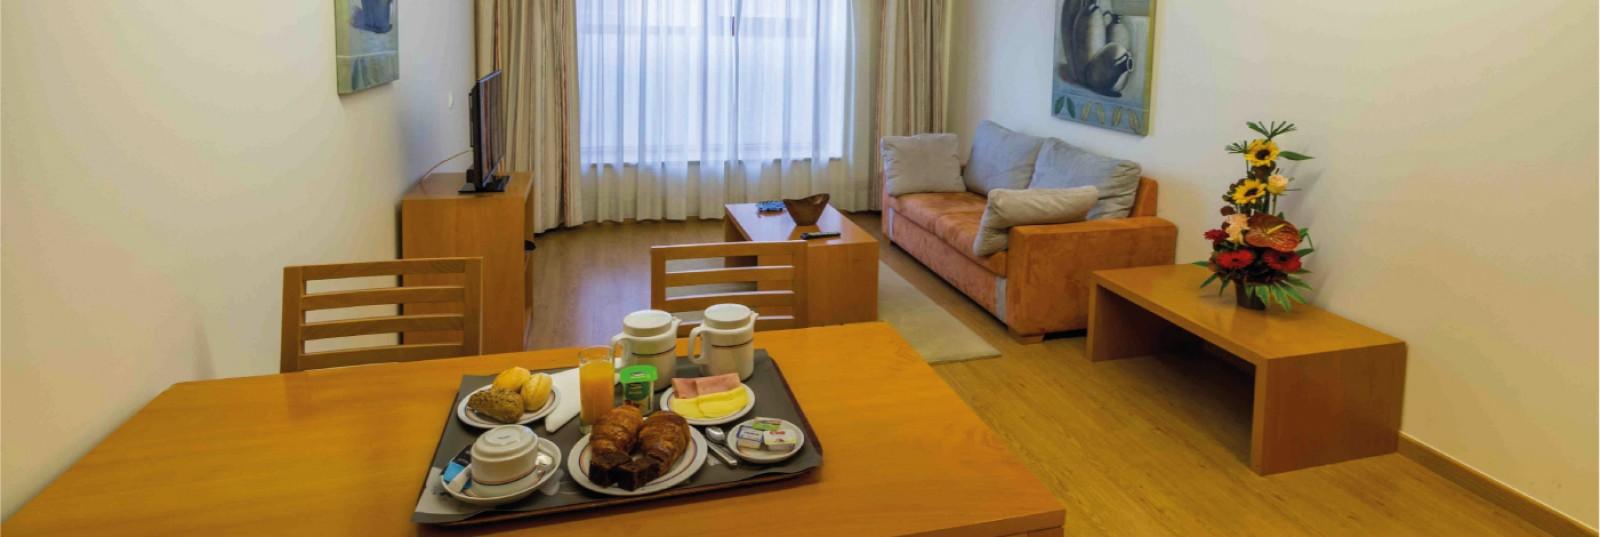 Eurosol Residence Apartment Hotel - T1